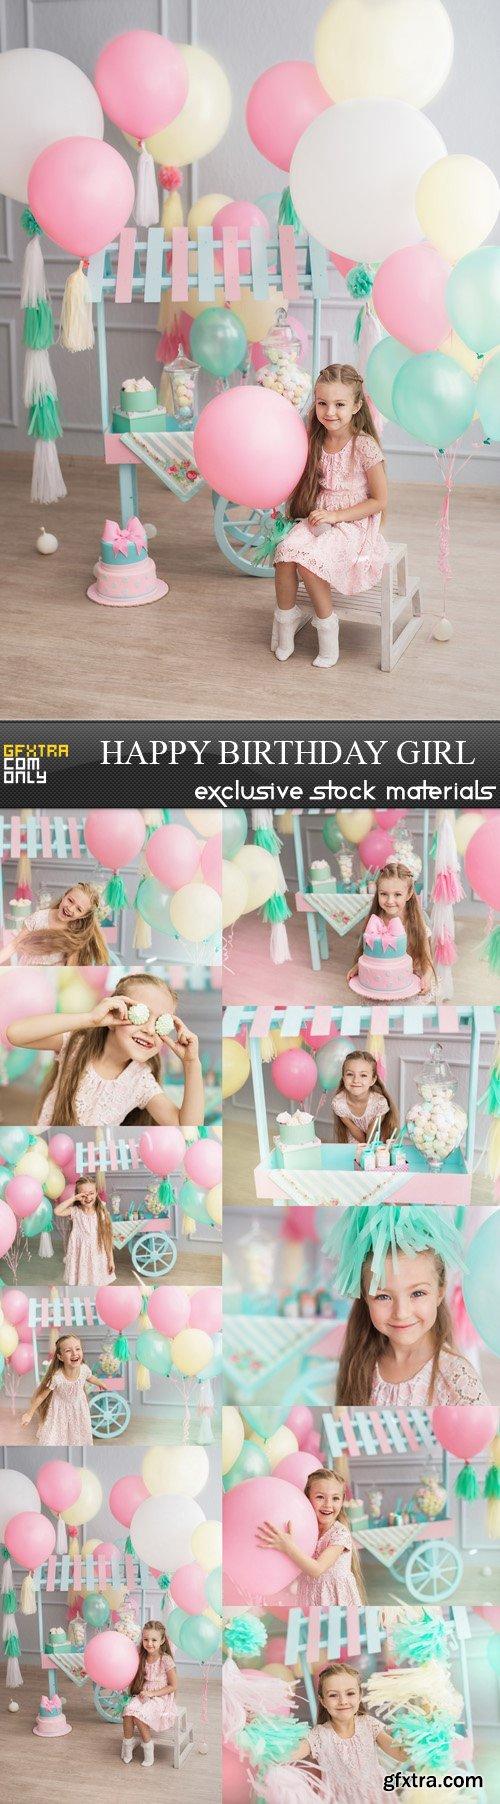 Happy Birthday Girl - 10 UHQ JPEG